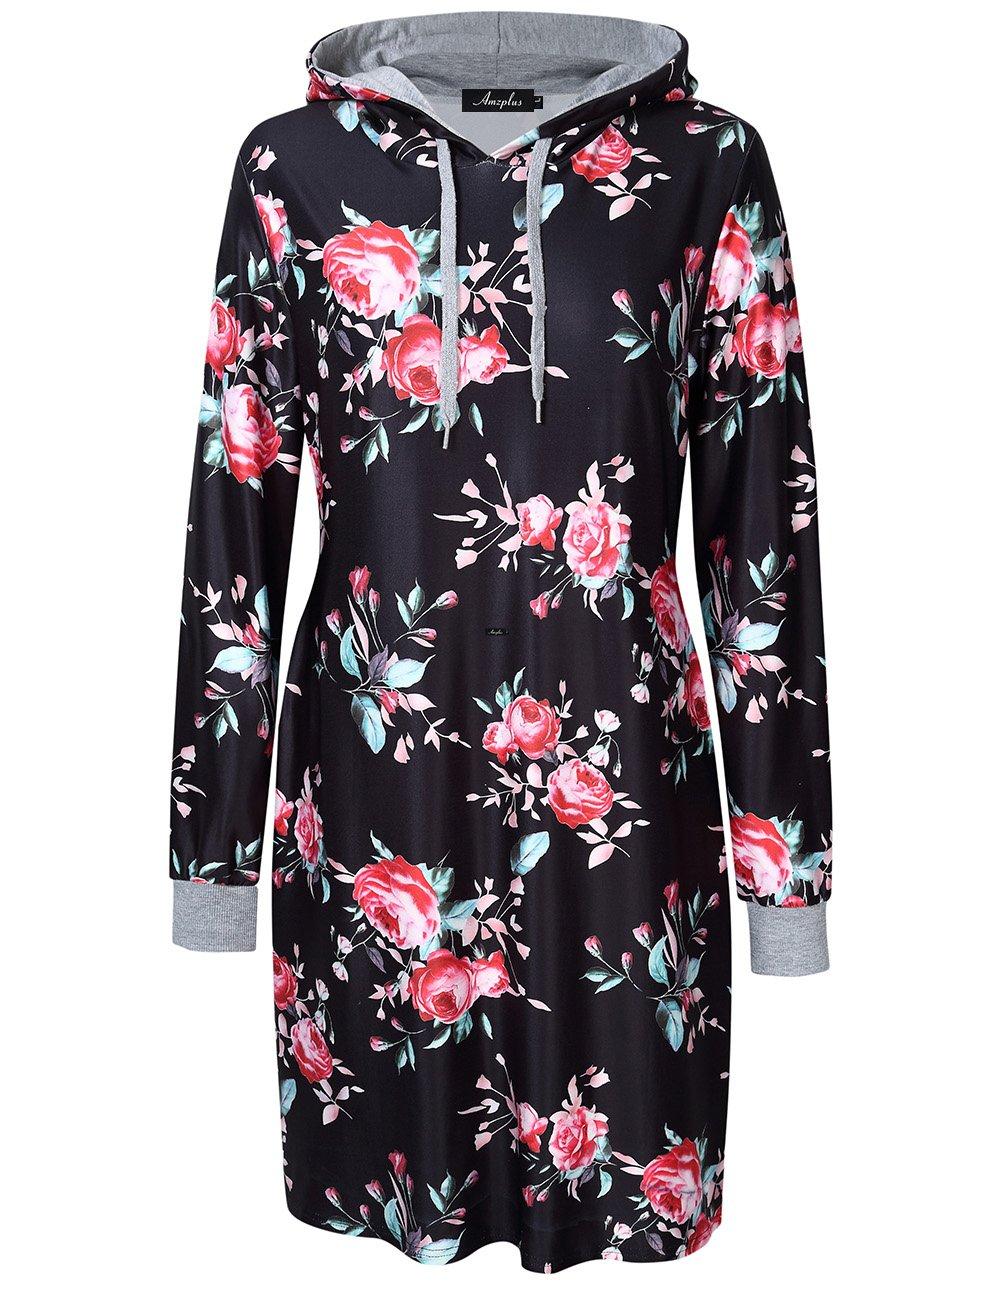 AMZ PLUS Womens Plus Size Pullover Keen Length Slim Sweatshirt Causal Hoodie Dress Black 5XL